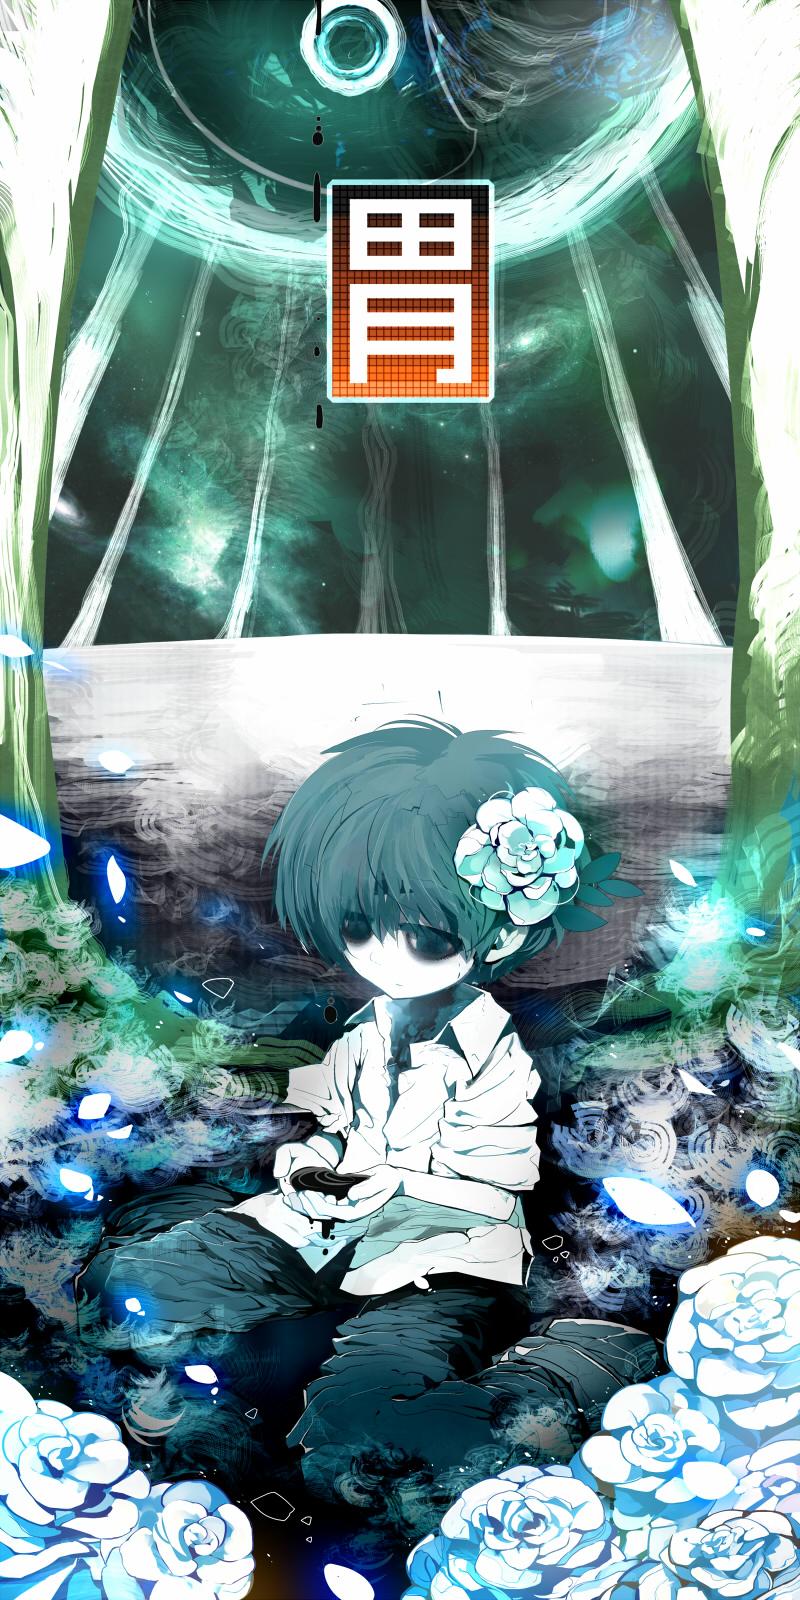 1boy bags_under_eyes flower hand_scoop highres kanji leaf mononoke_(empty) original partially_submerged petals shirt short_hair sitting solo translated wariza water